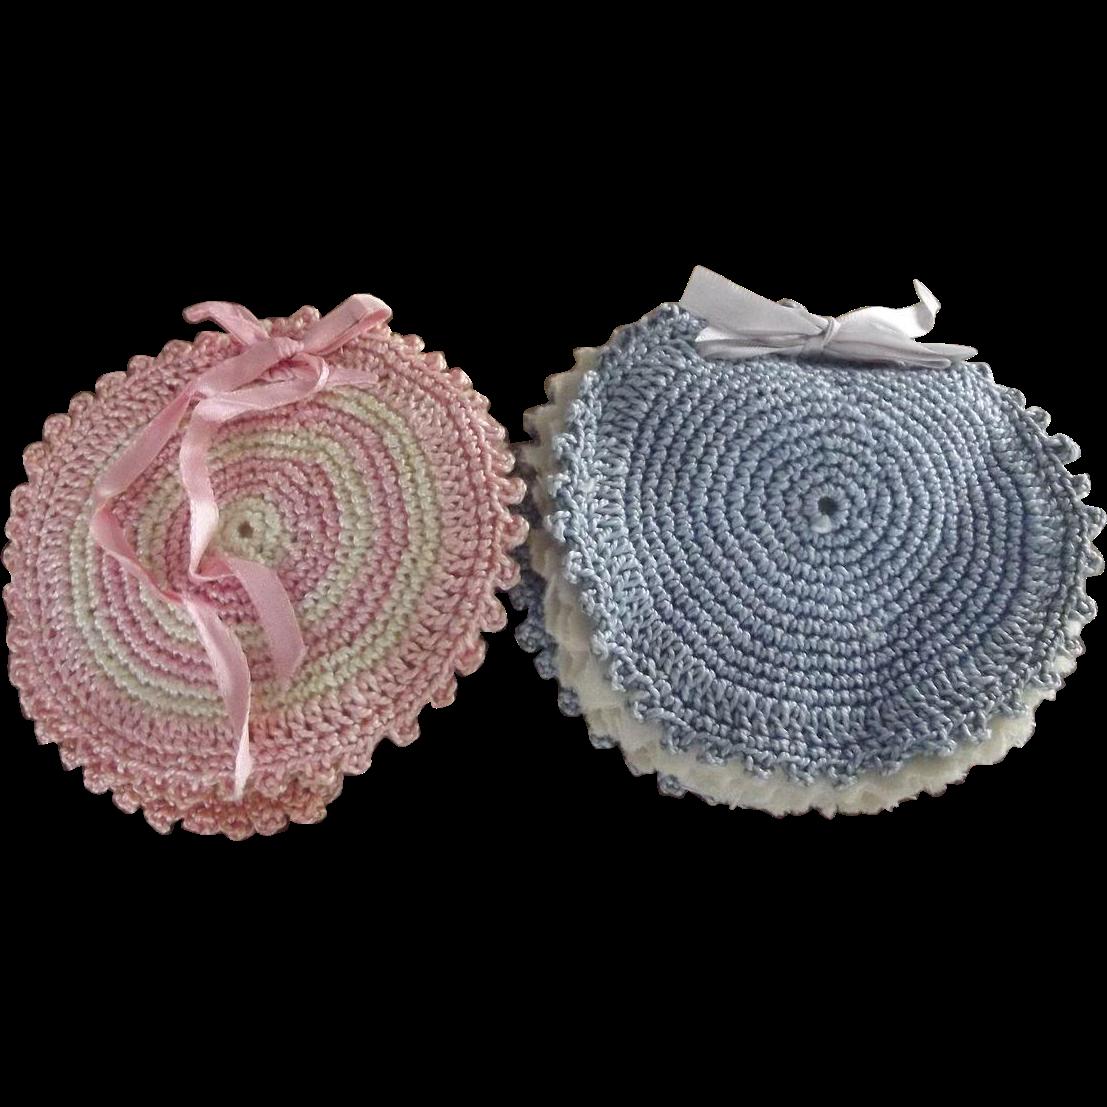 Pair of Crocheted Pincushions